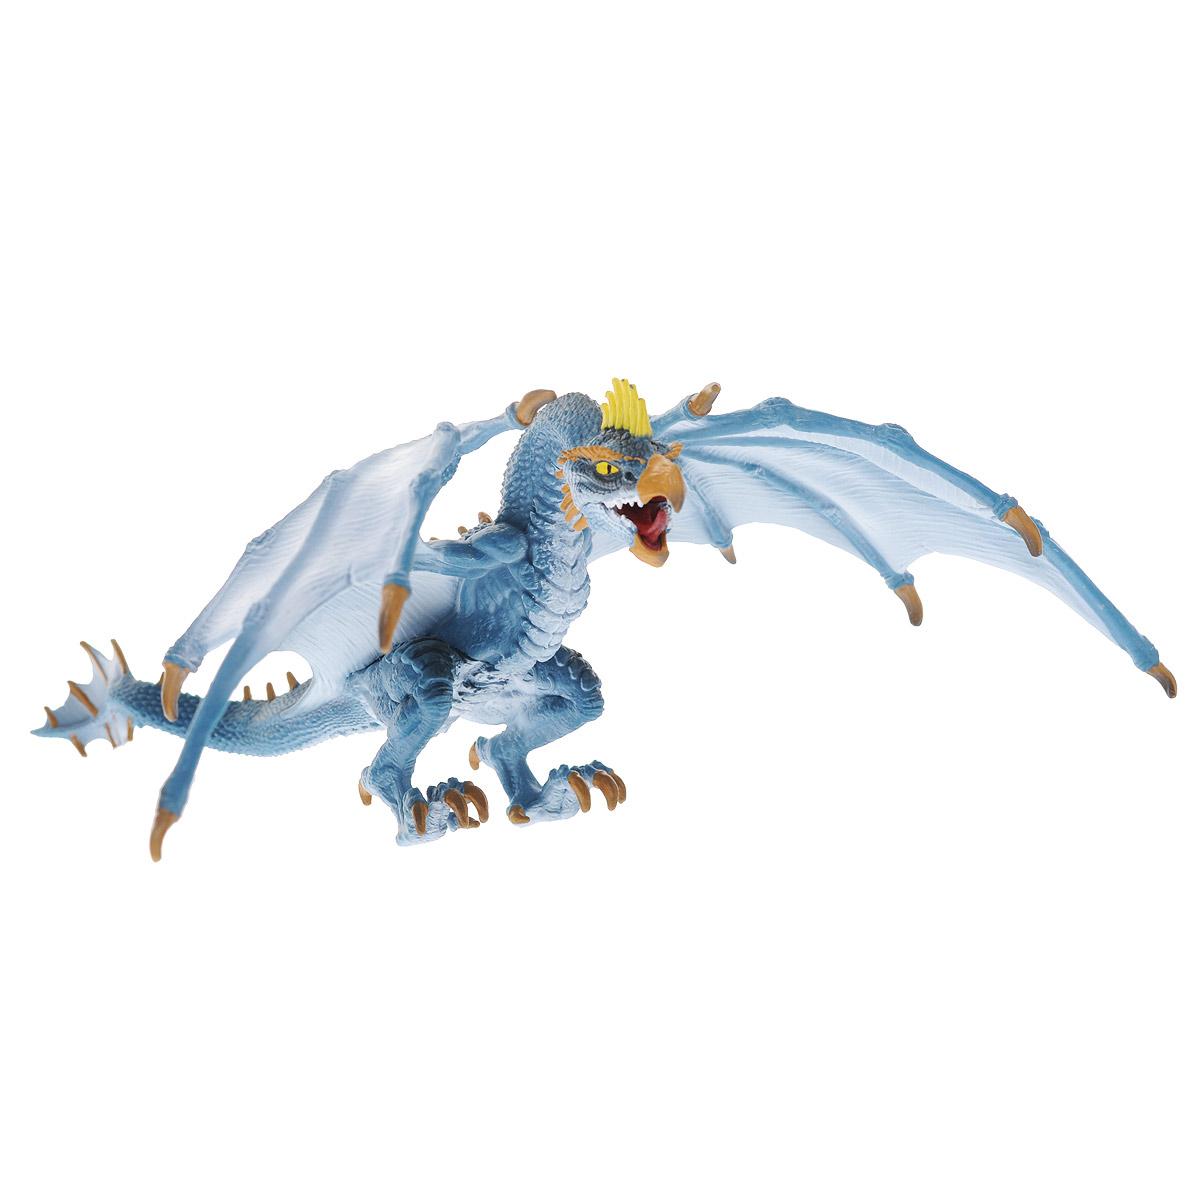 Schleich Фигурка Дракон Летун фигурки игрушки schleich дракон летун